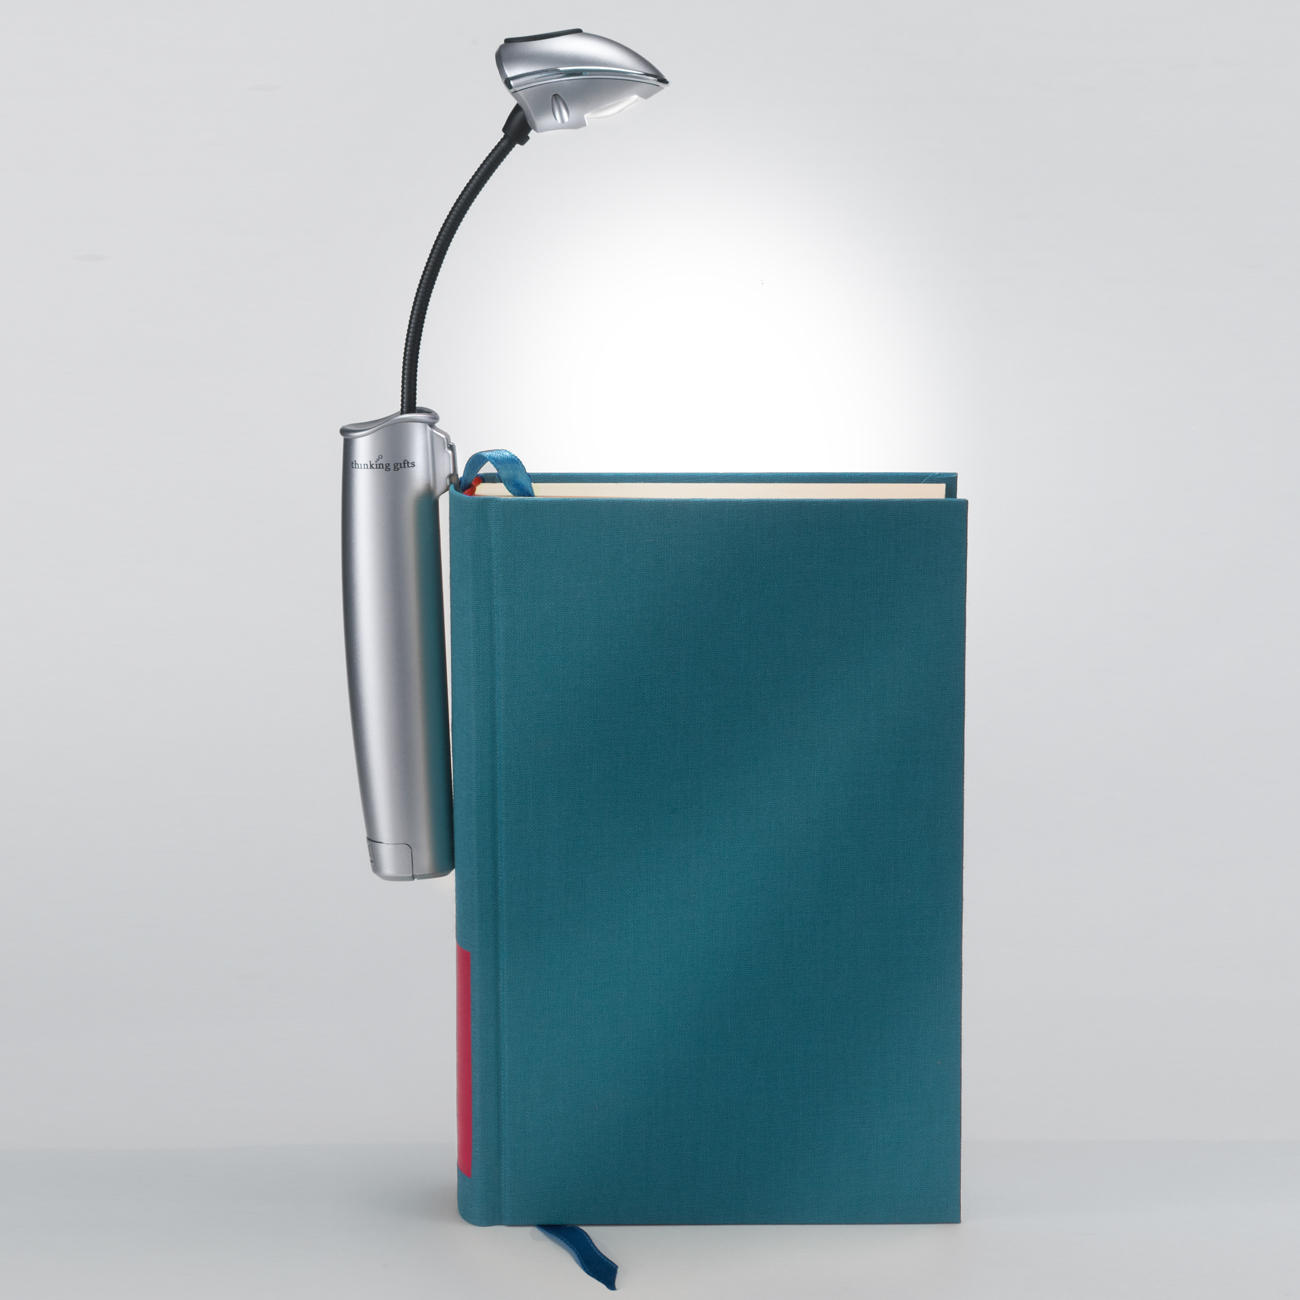 booklight garantie produit de 3 ans. Black Bedroom Furniture Sets. Home Design Ideas